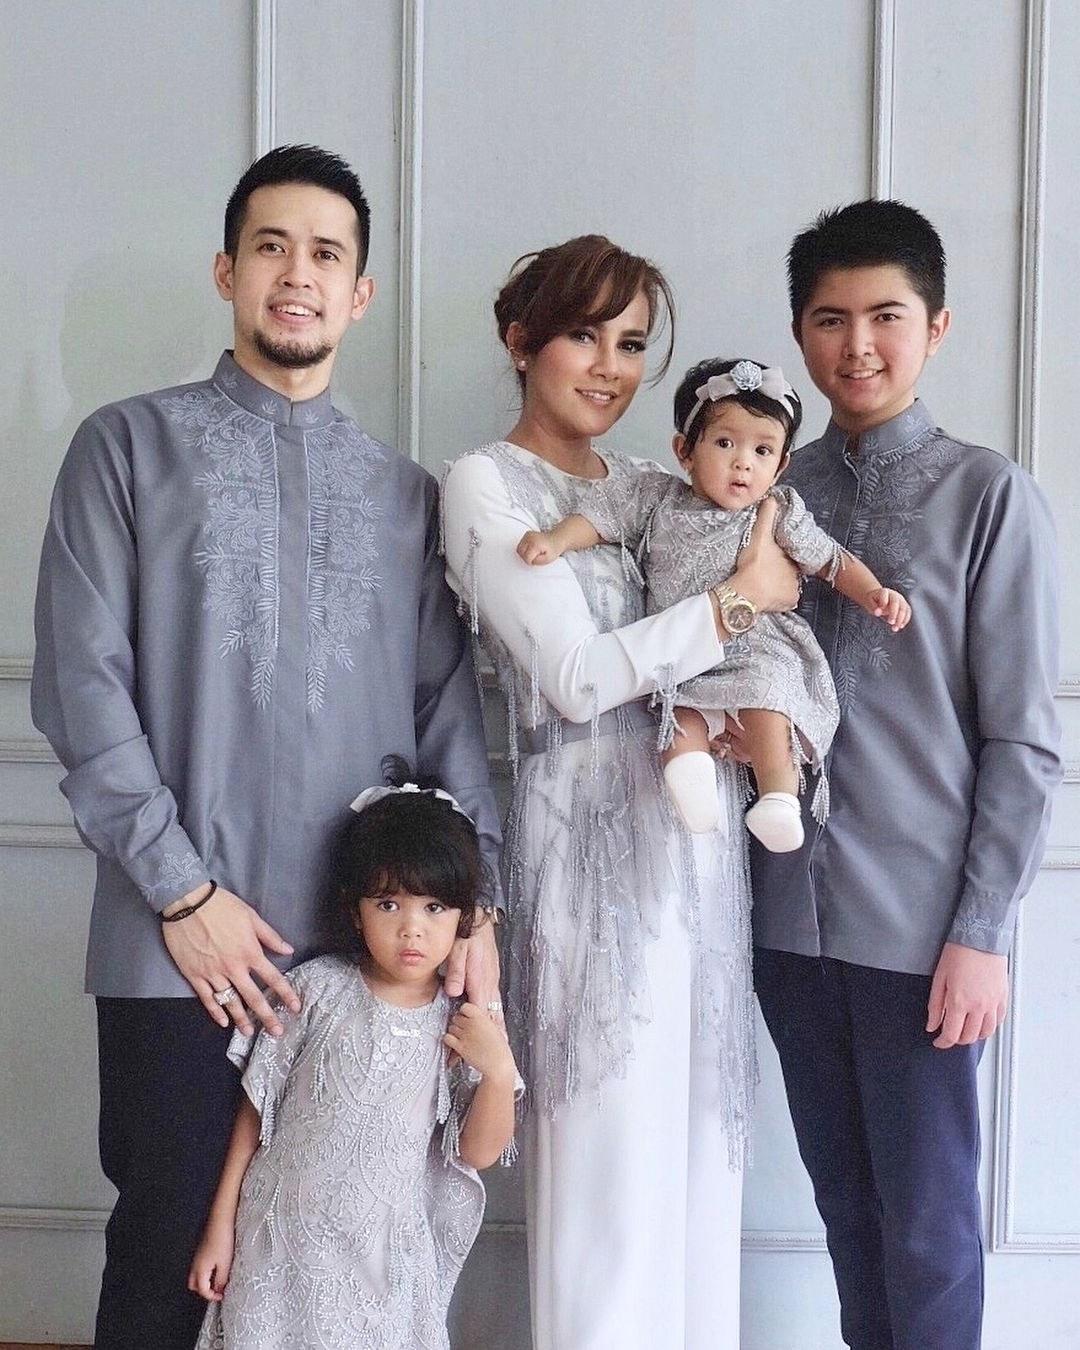 Model Inspirasi Baju Lebaran Keluarga Qwdq Baju Lebaran Buat Keluarga Mainmata Studio